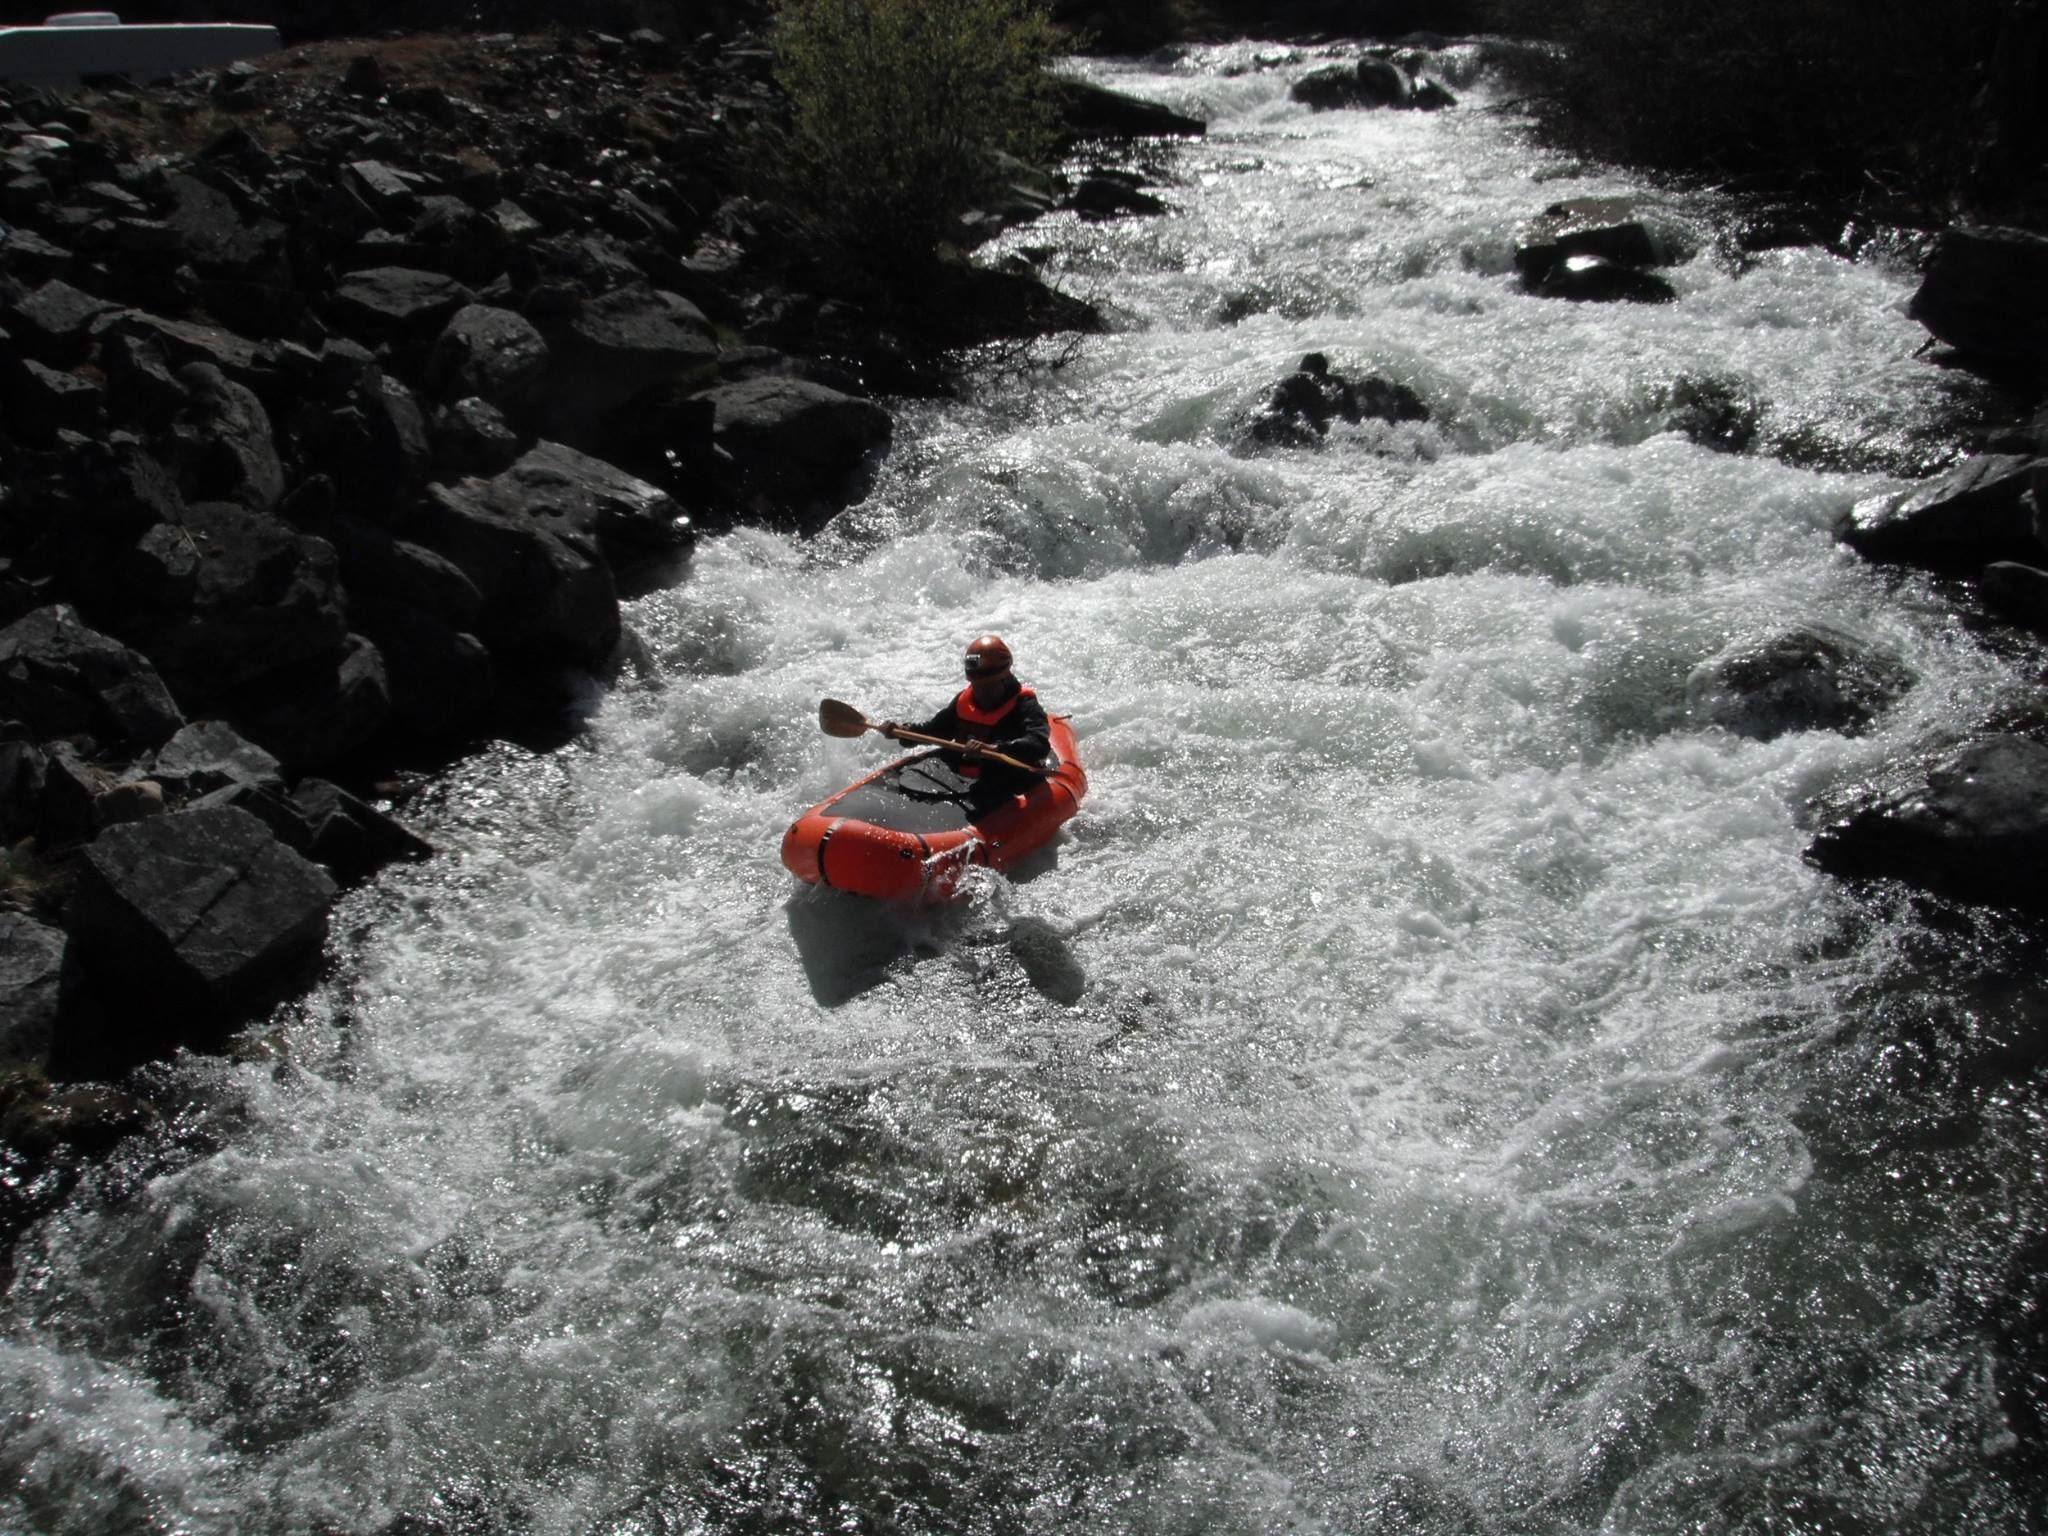 Solo-rafting i packraft